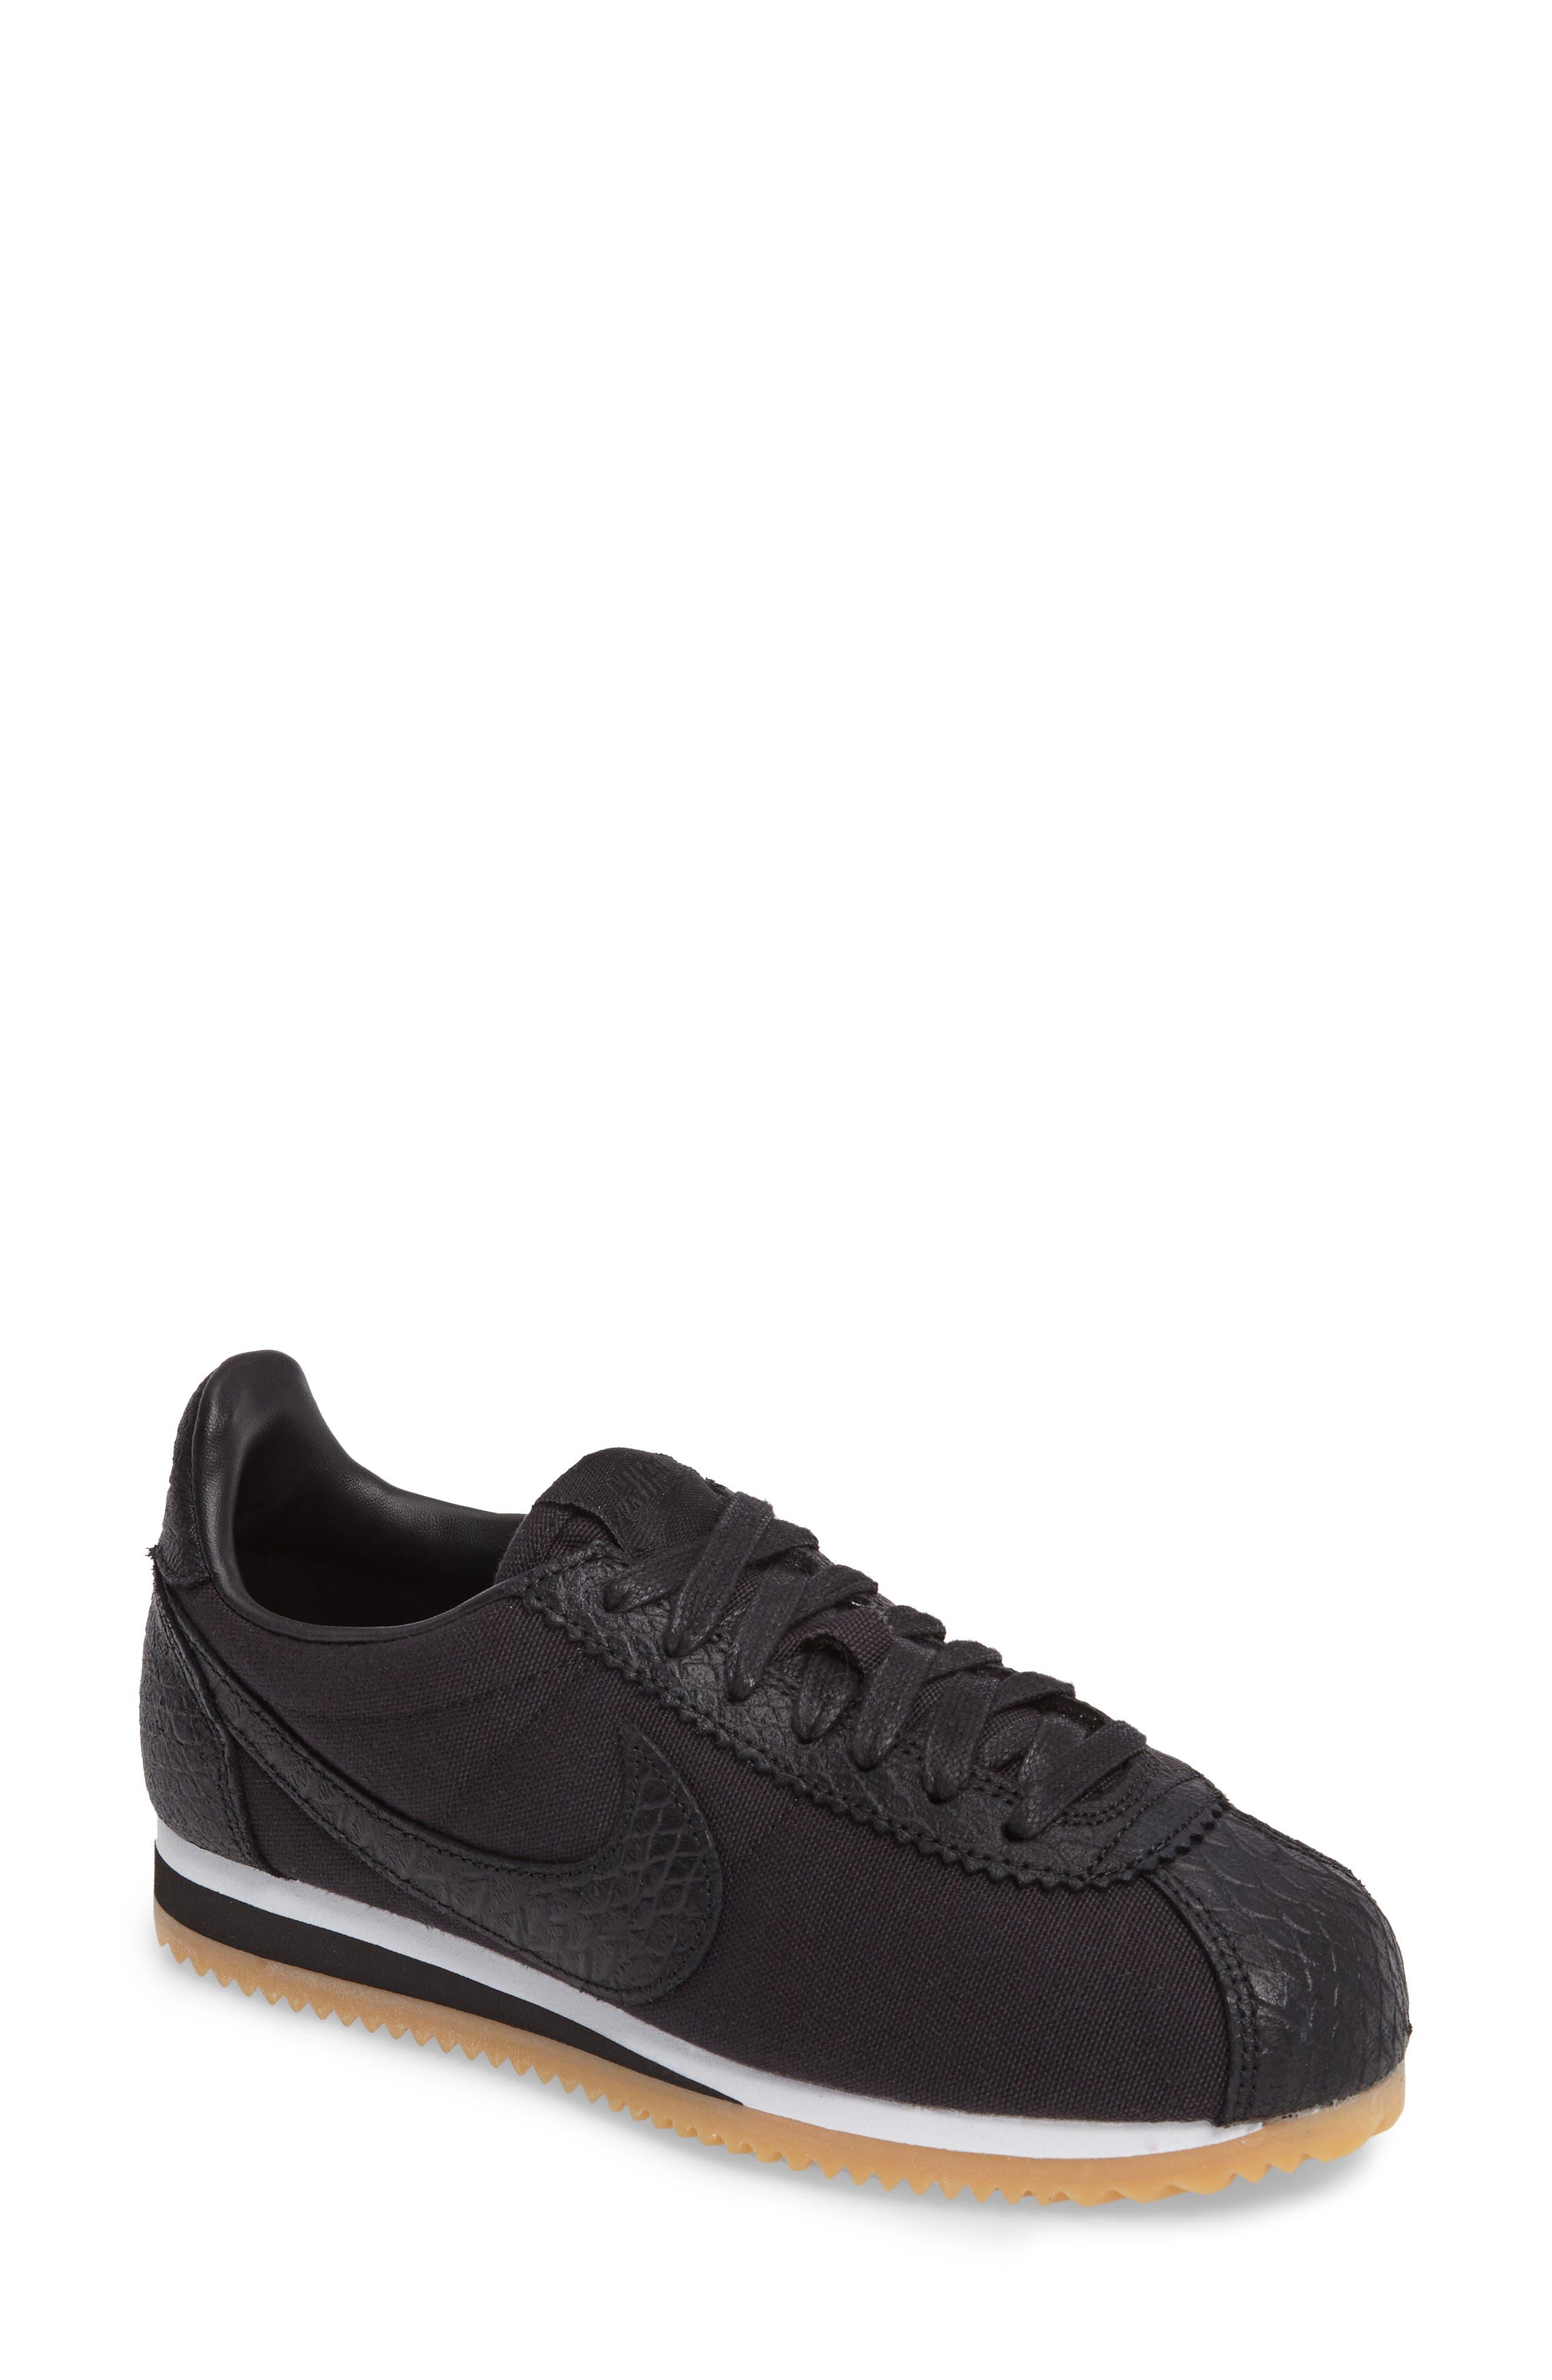 Classic Cortez SE Sneaker,                             Main thumbnail 1, color,                             Black/ White/ Gum Yellow